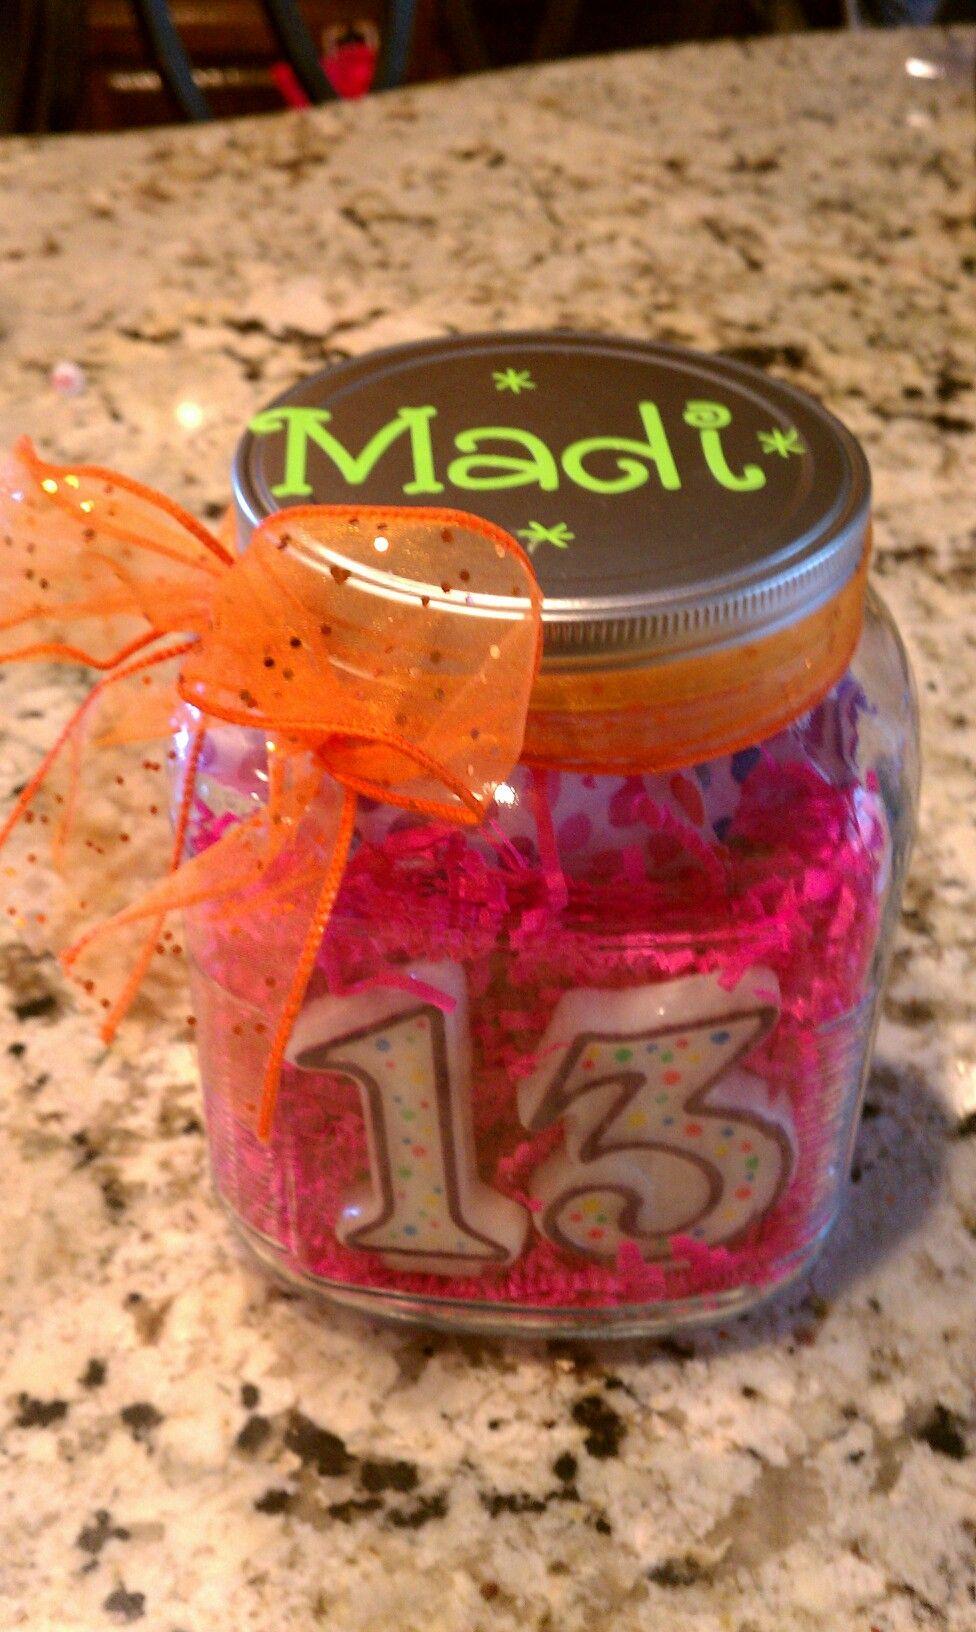 13th bday party present mason jar bday candlesgift